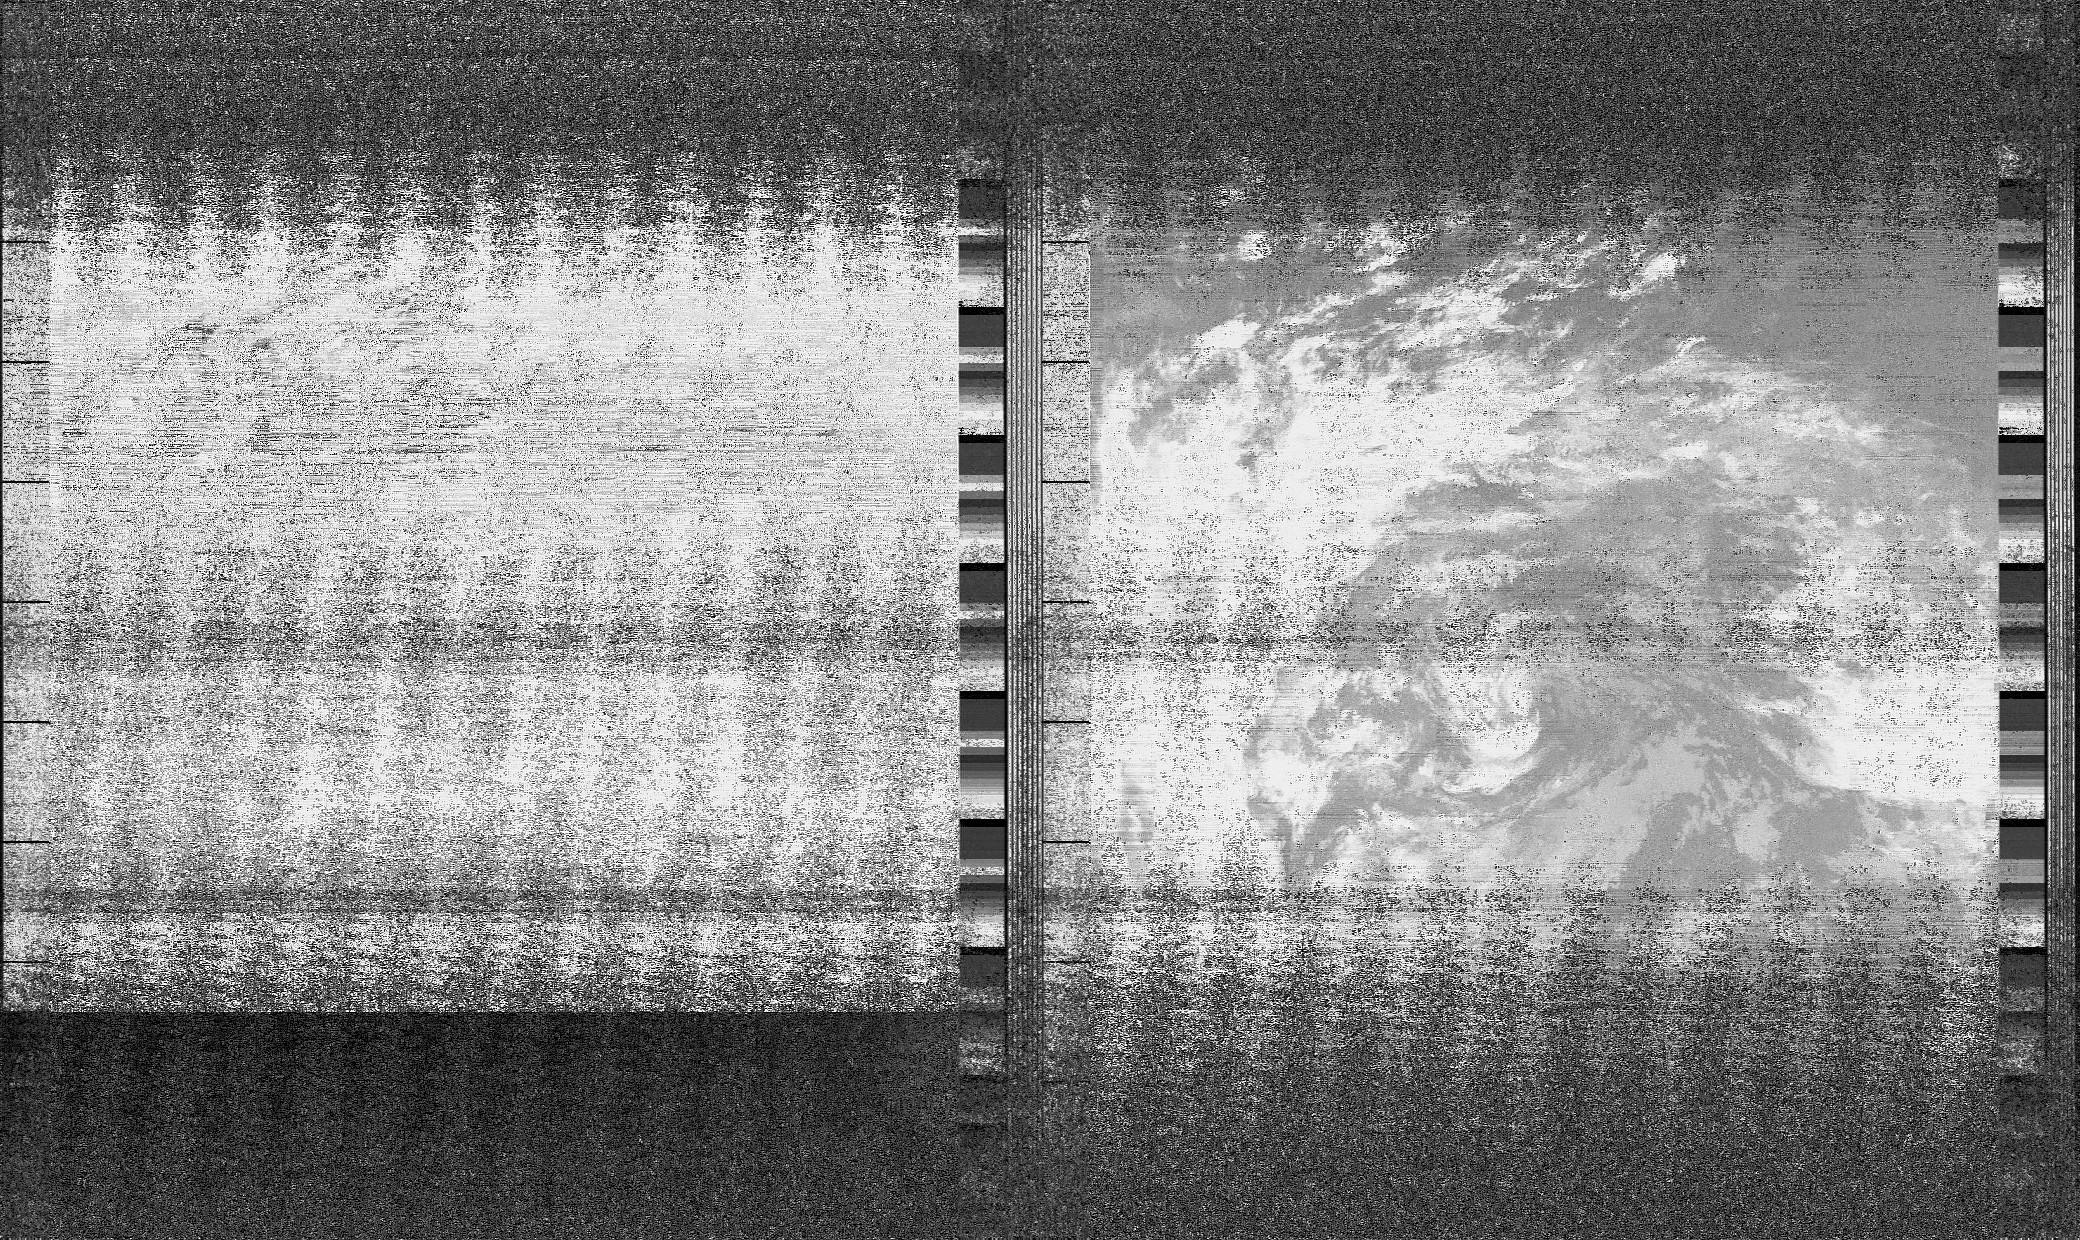 NOAA18_5_8_137.915_22:06